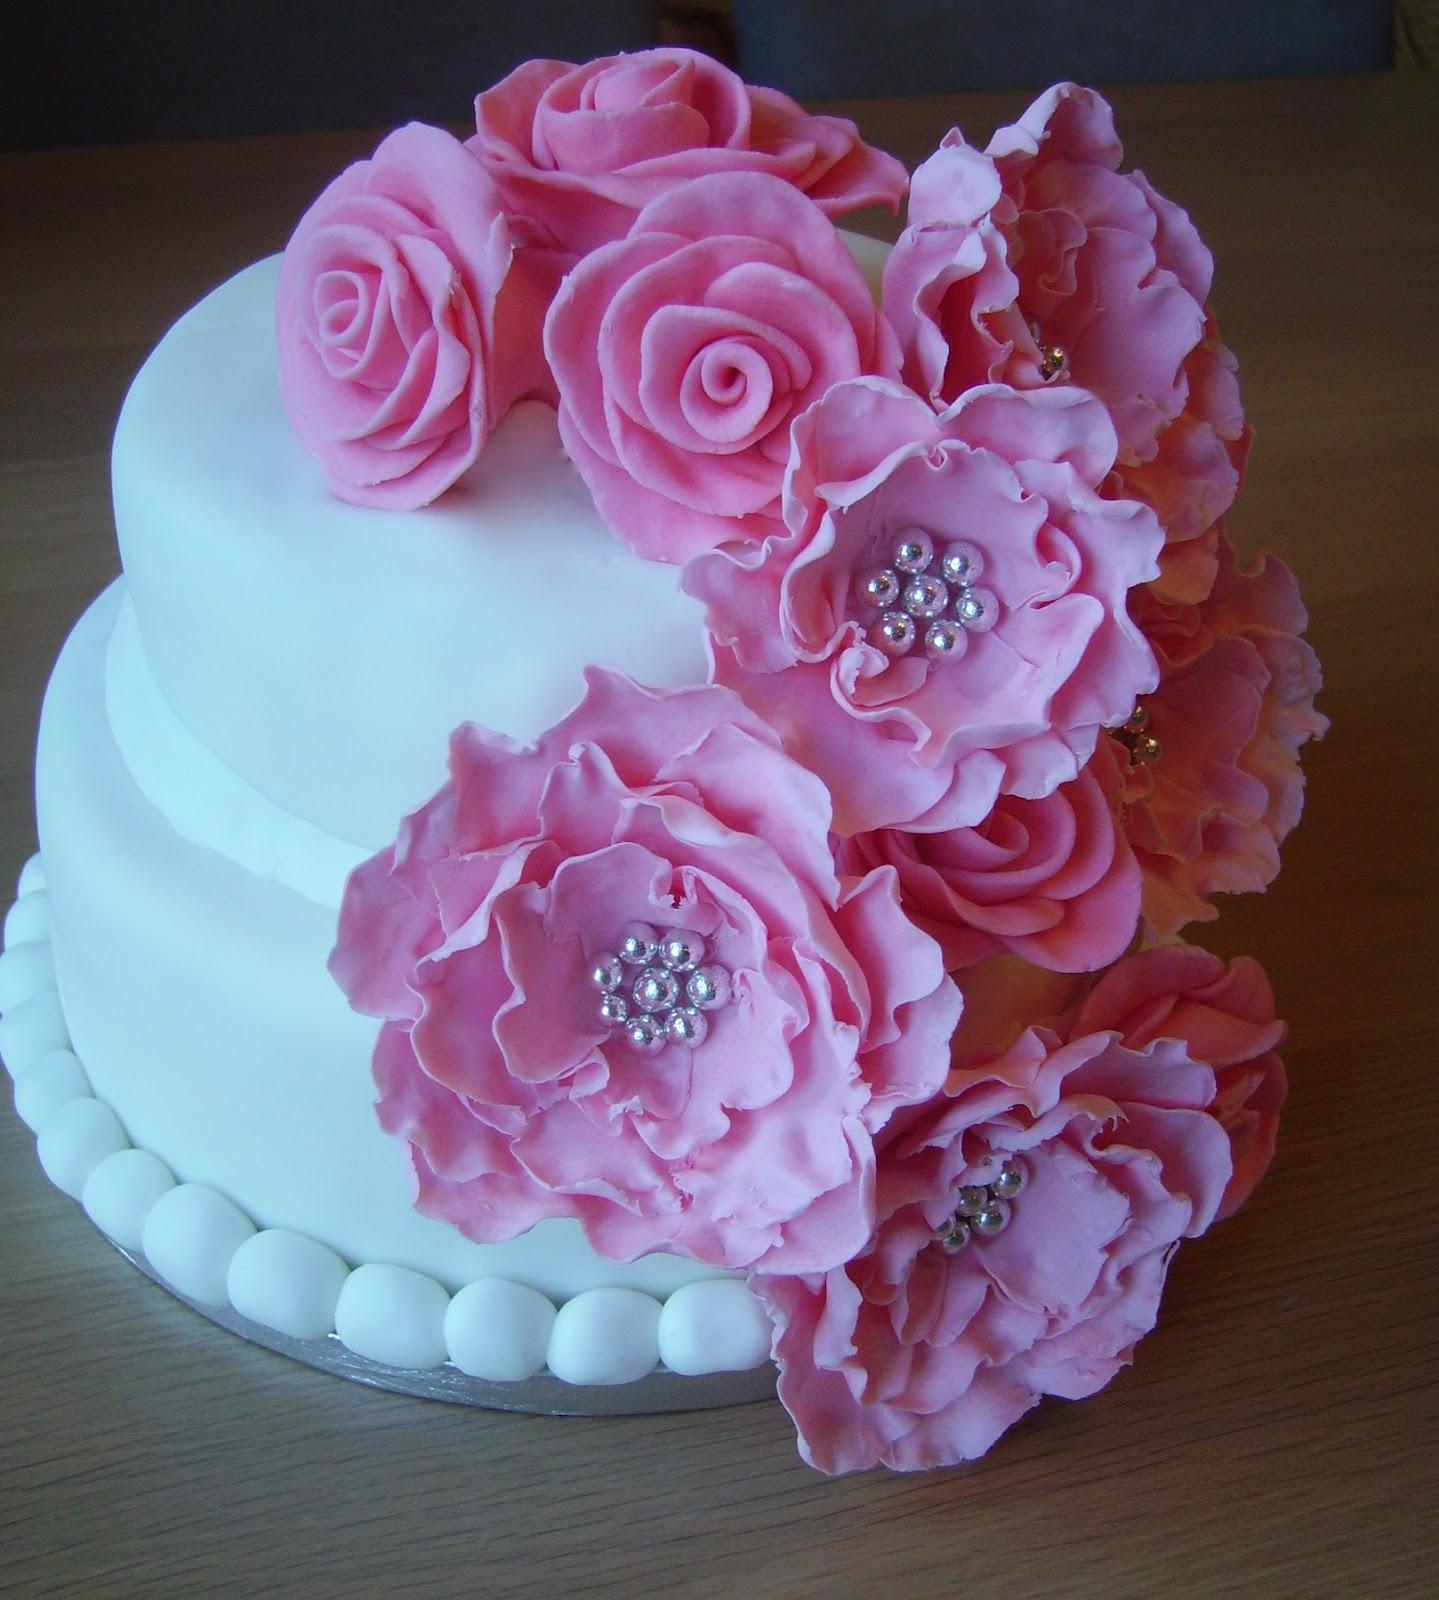 11 red flower birthday cakes photo birthday cake with red flowers pink and white birthday cakes with flowers izmirmasajfo